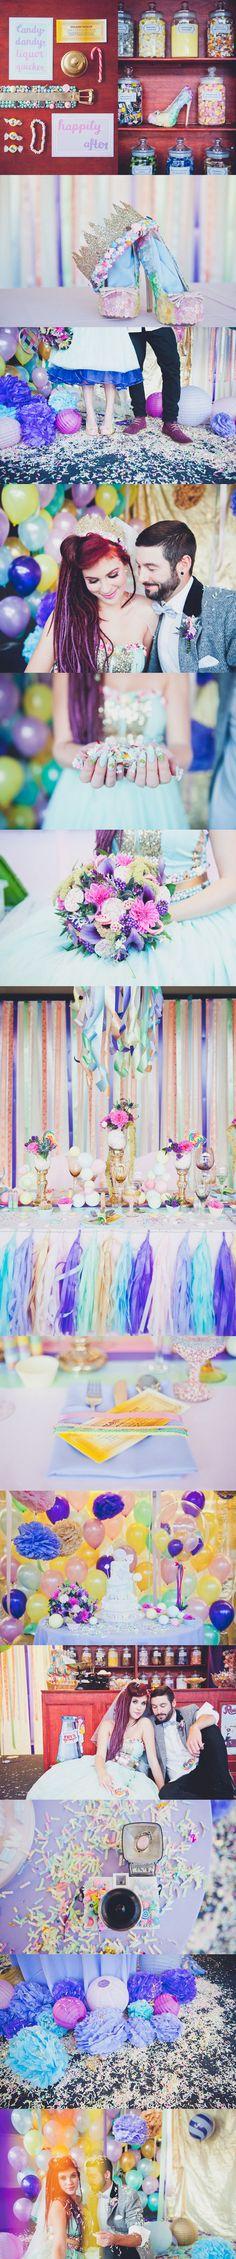 Weird & Wonderful Wedding World : Willy Wonka inspiration #candy #sweet #colorful